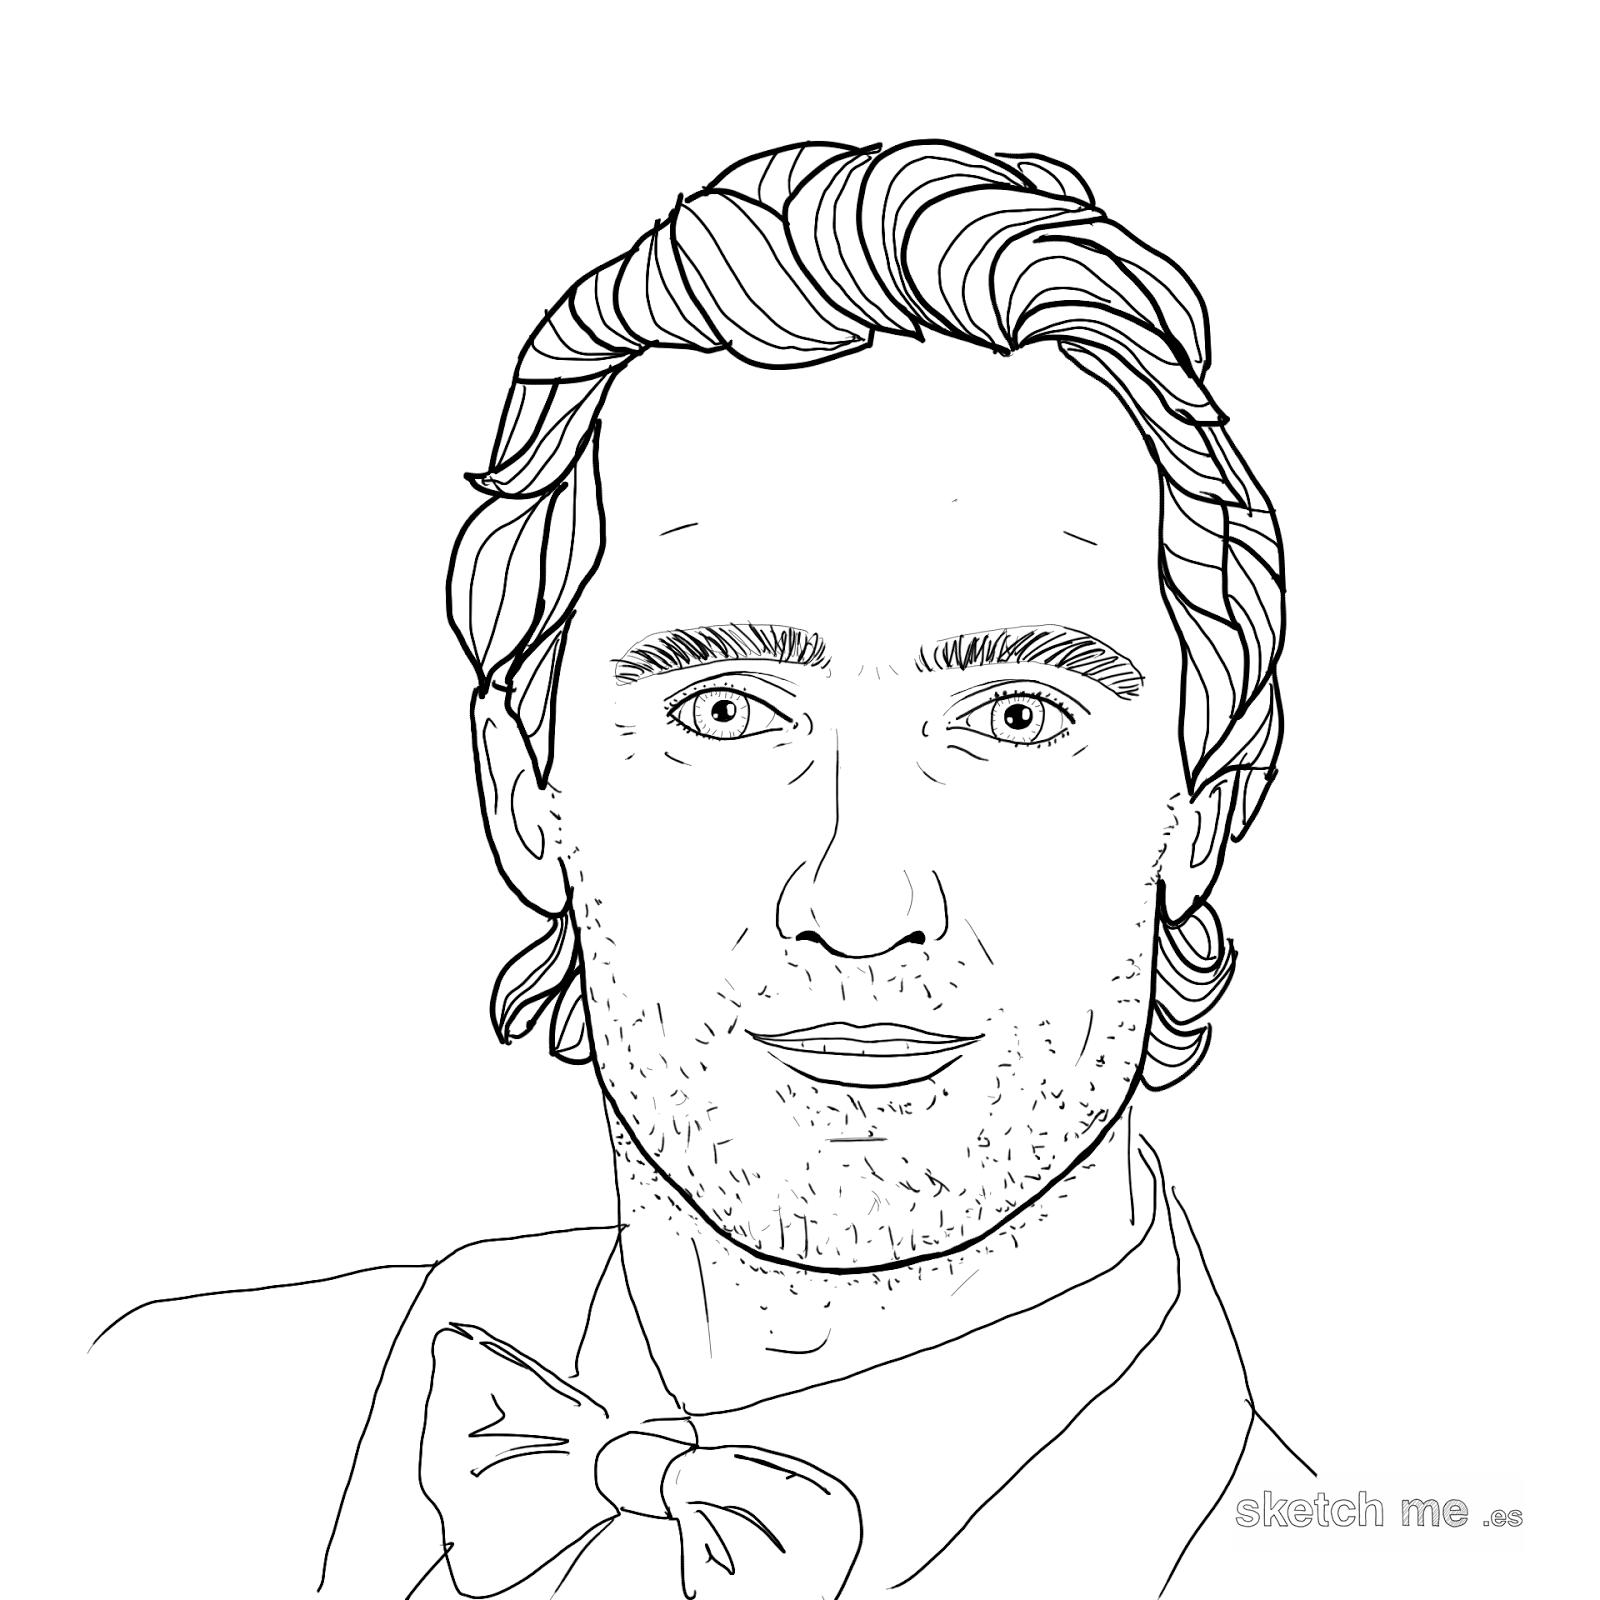 Matthew-McConaughey-sketch-me-custom-portraits-for-facebook-and-twitter-profiles-retratos-personalizados-dibujados-a-mano